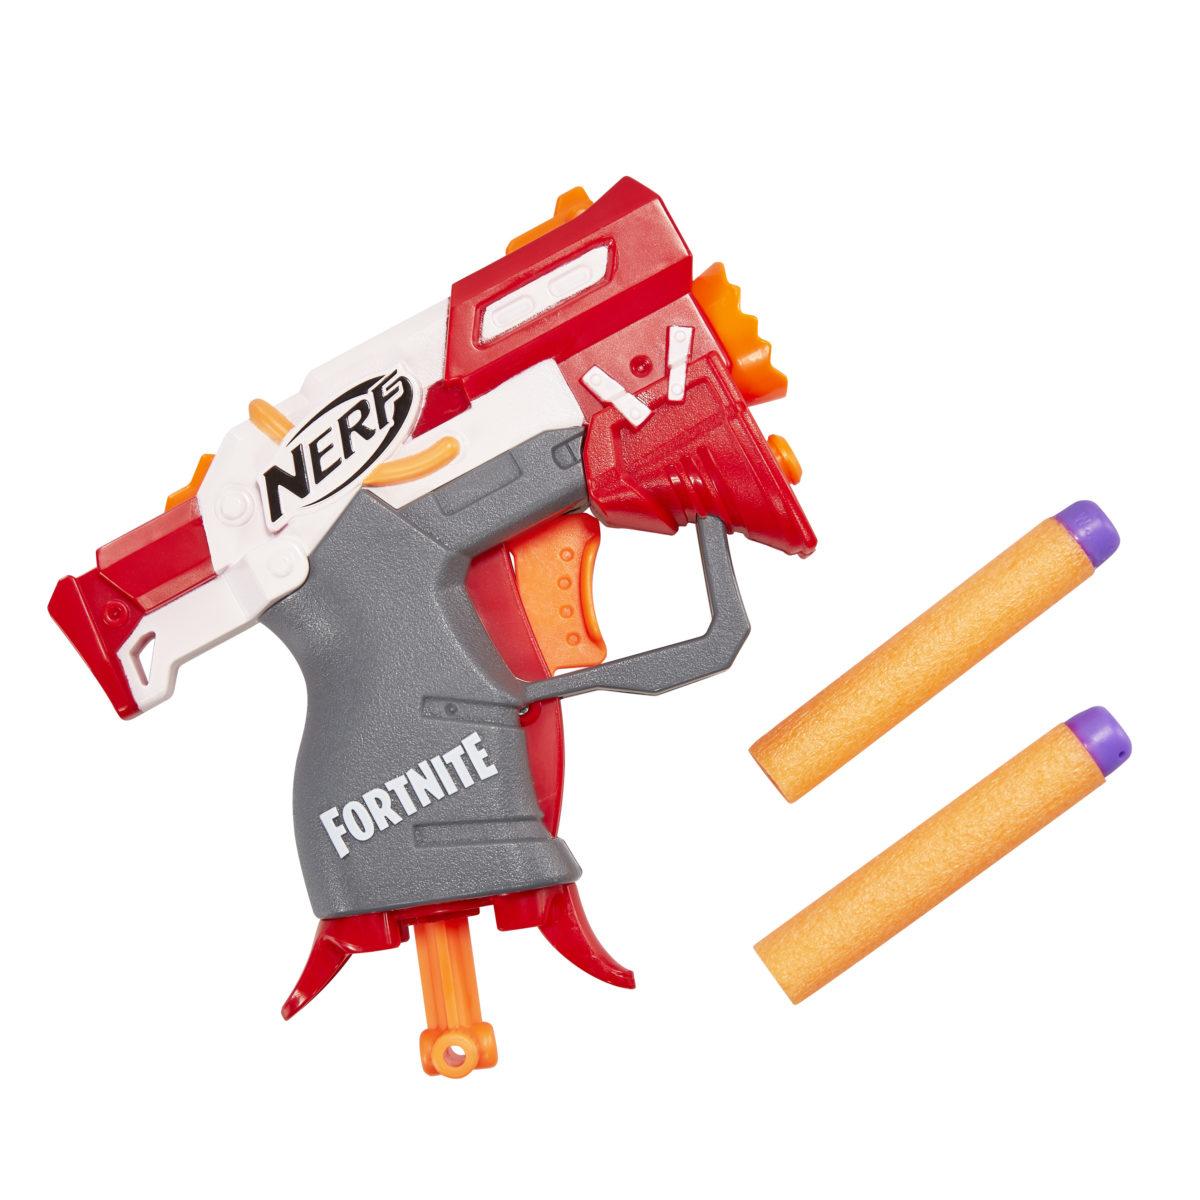 NERF Fortnite MicroShots